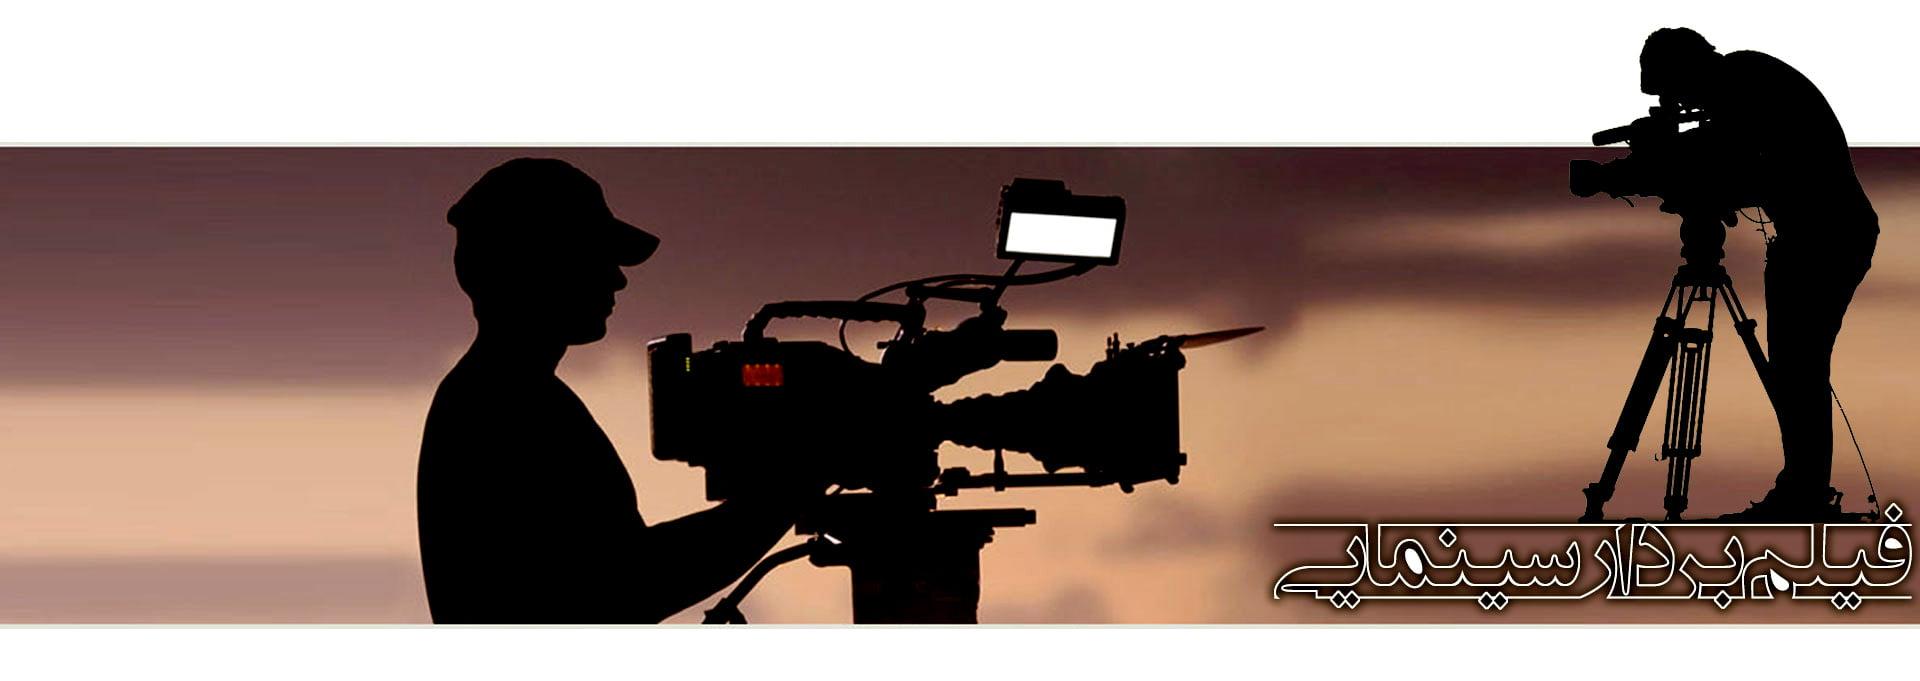 cinematographer 1a 1 - معرفی شغل فیلمبرداری و تصویربرداری